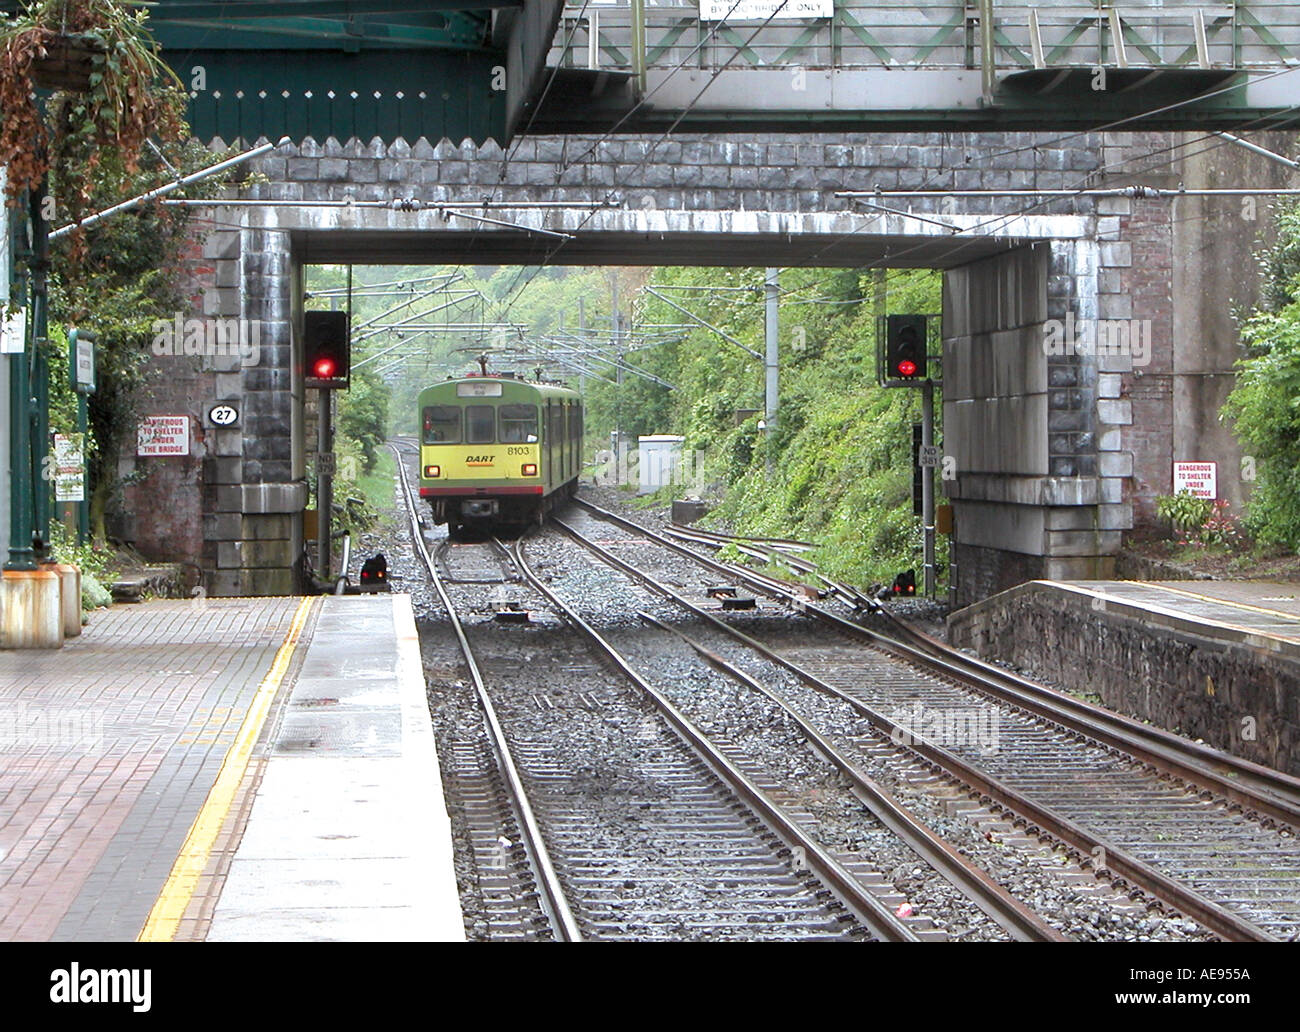 Dart train from Bray approaching Malahide Station Dublin - Stock Image